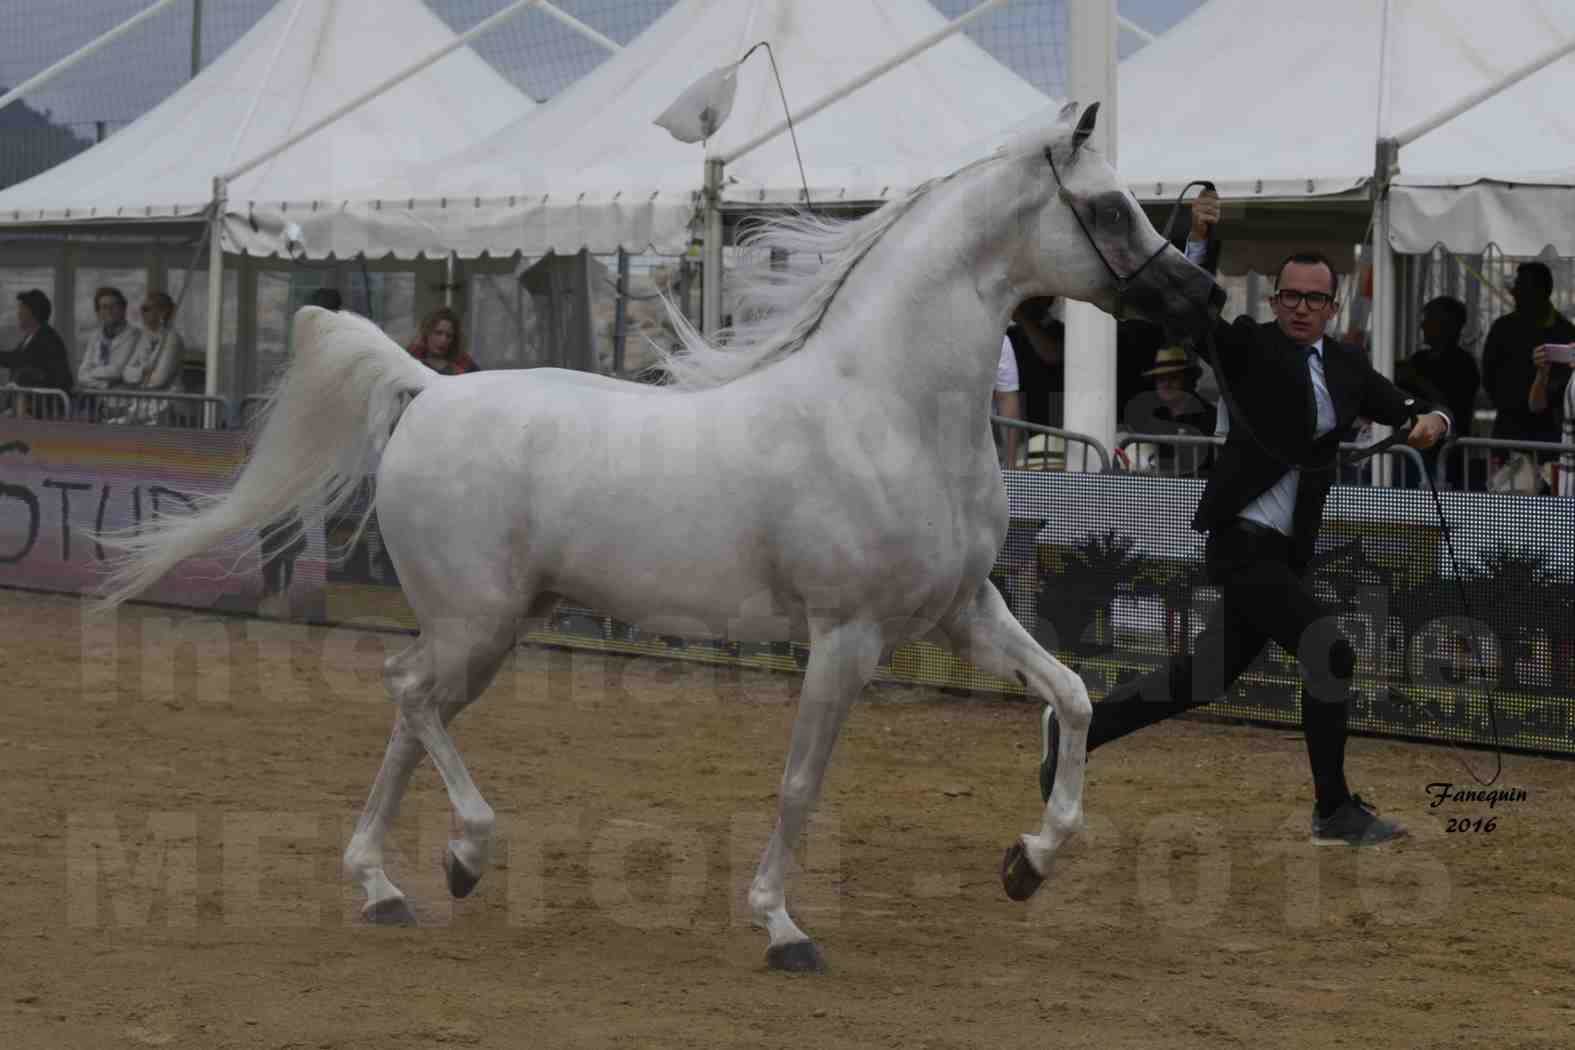 Show International de chevaux ARABES de MENTON 2016 - AJA ANGELO - 02